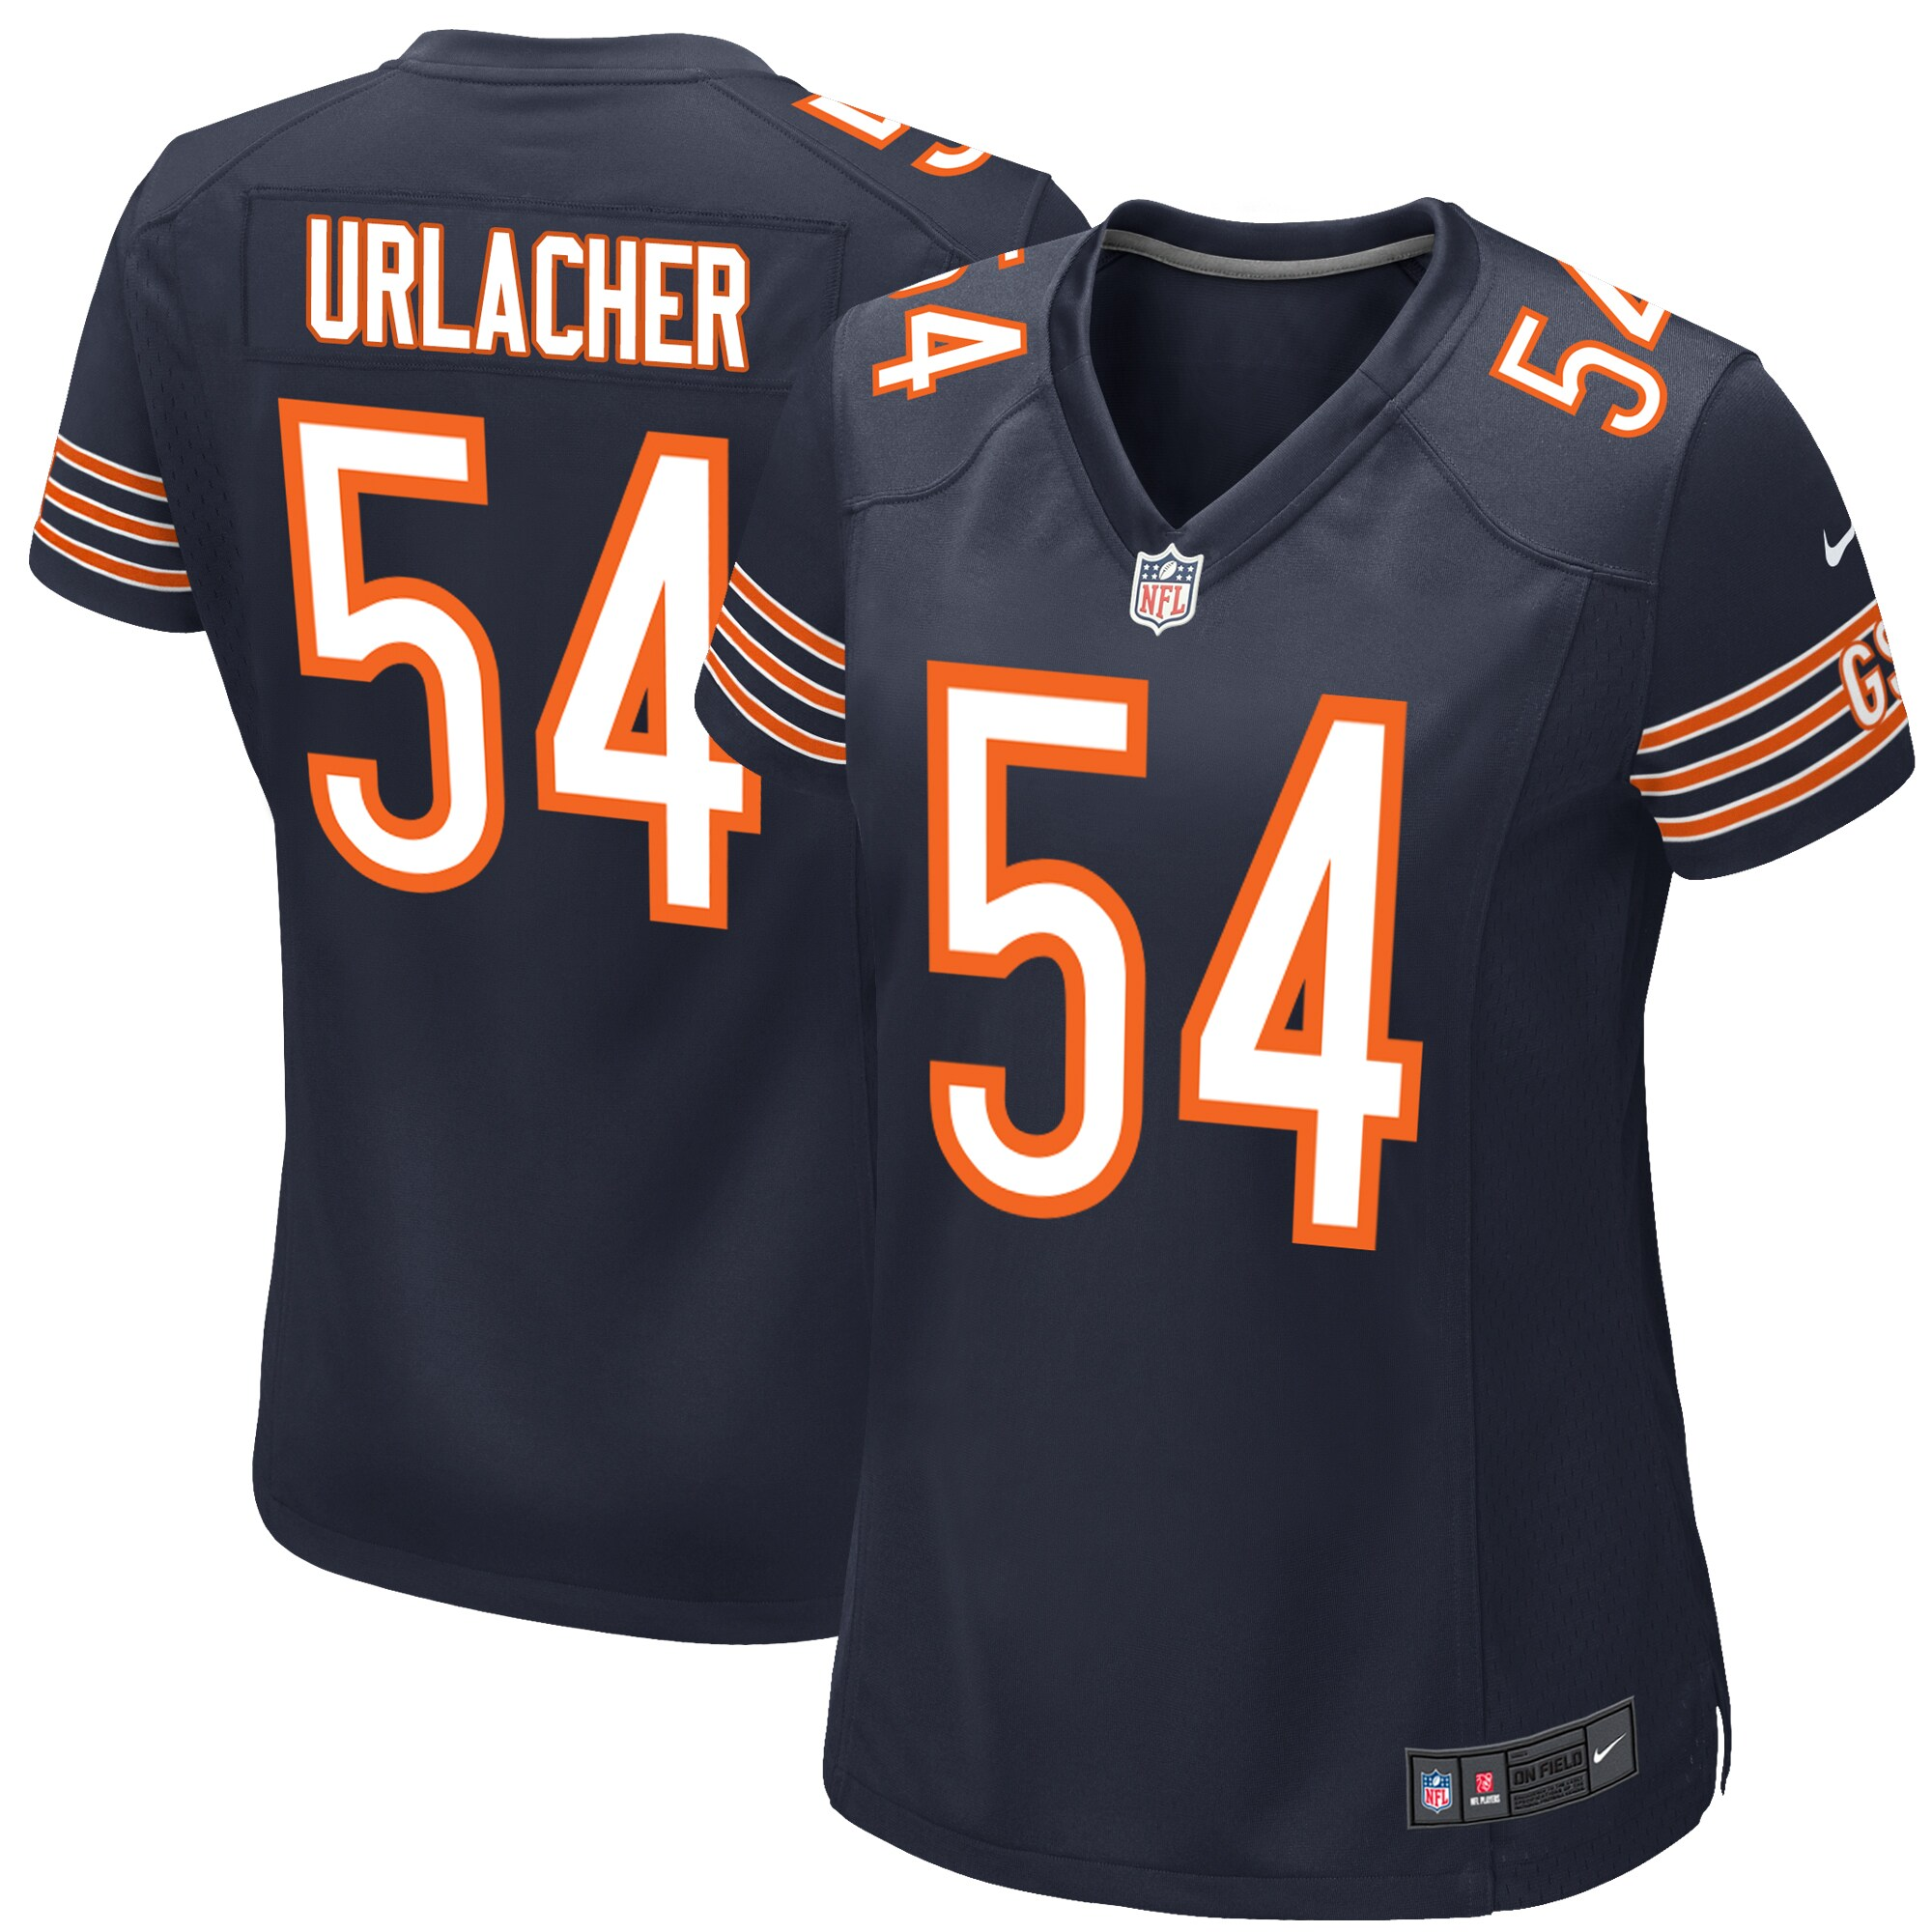 Brian Urlacher Chicago Bears Nike Women's Game Jersey - Navy Blue